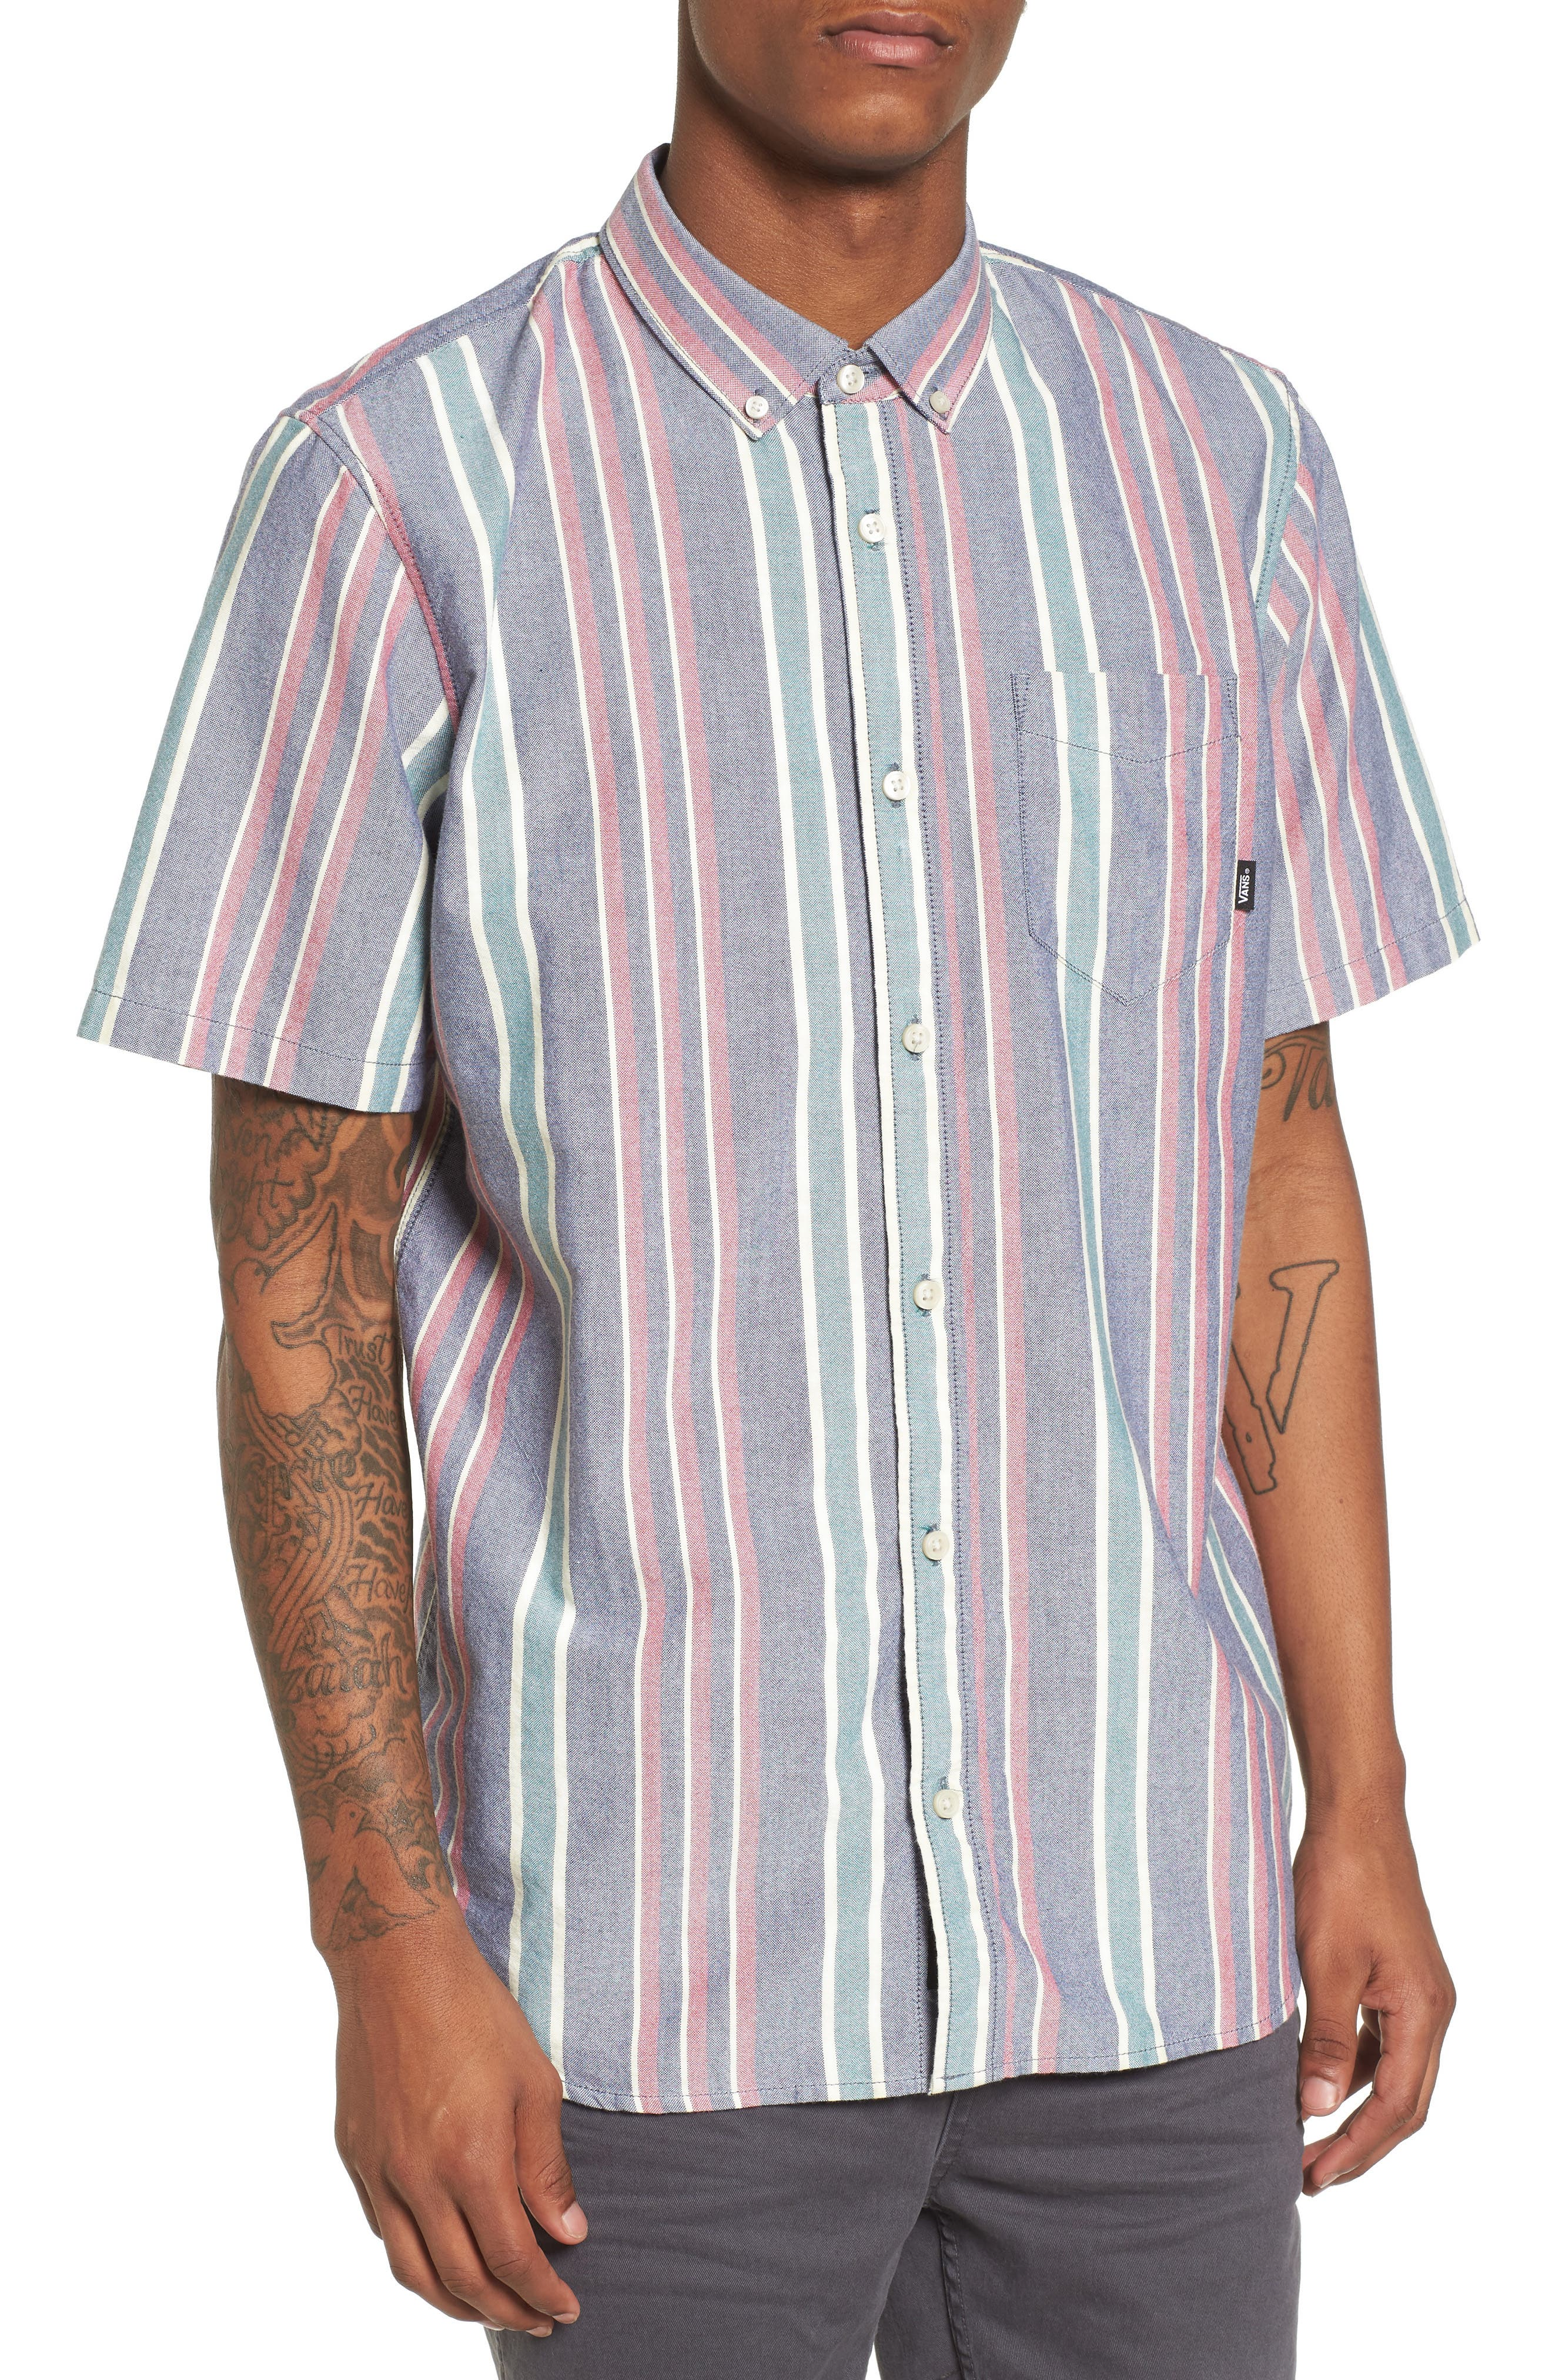 Houser Short Sleeve Shirt,                             Main thumbnail 1, color,                             Dress Blues/ Evergreen